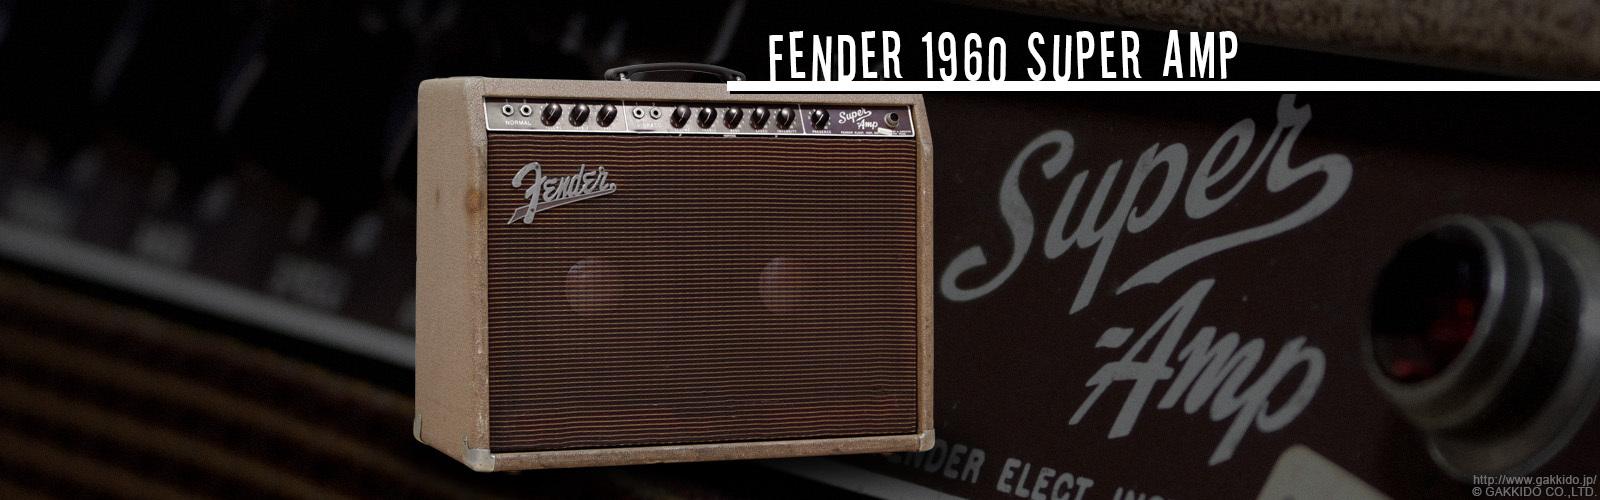 Fender 1960 Super Amp ギターアンプ コンボ [中古品]